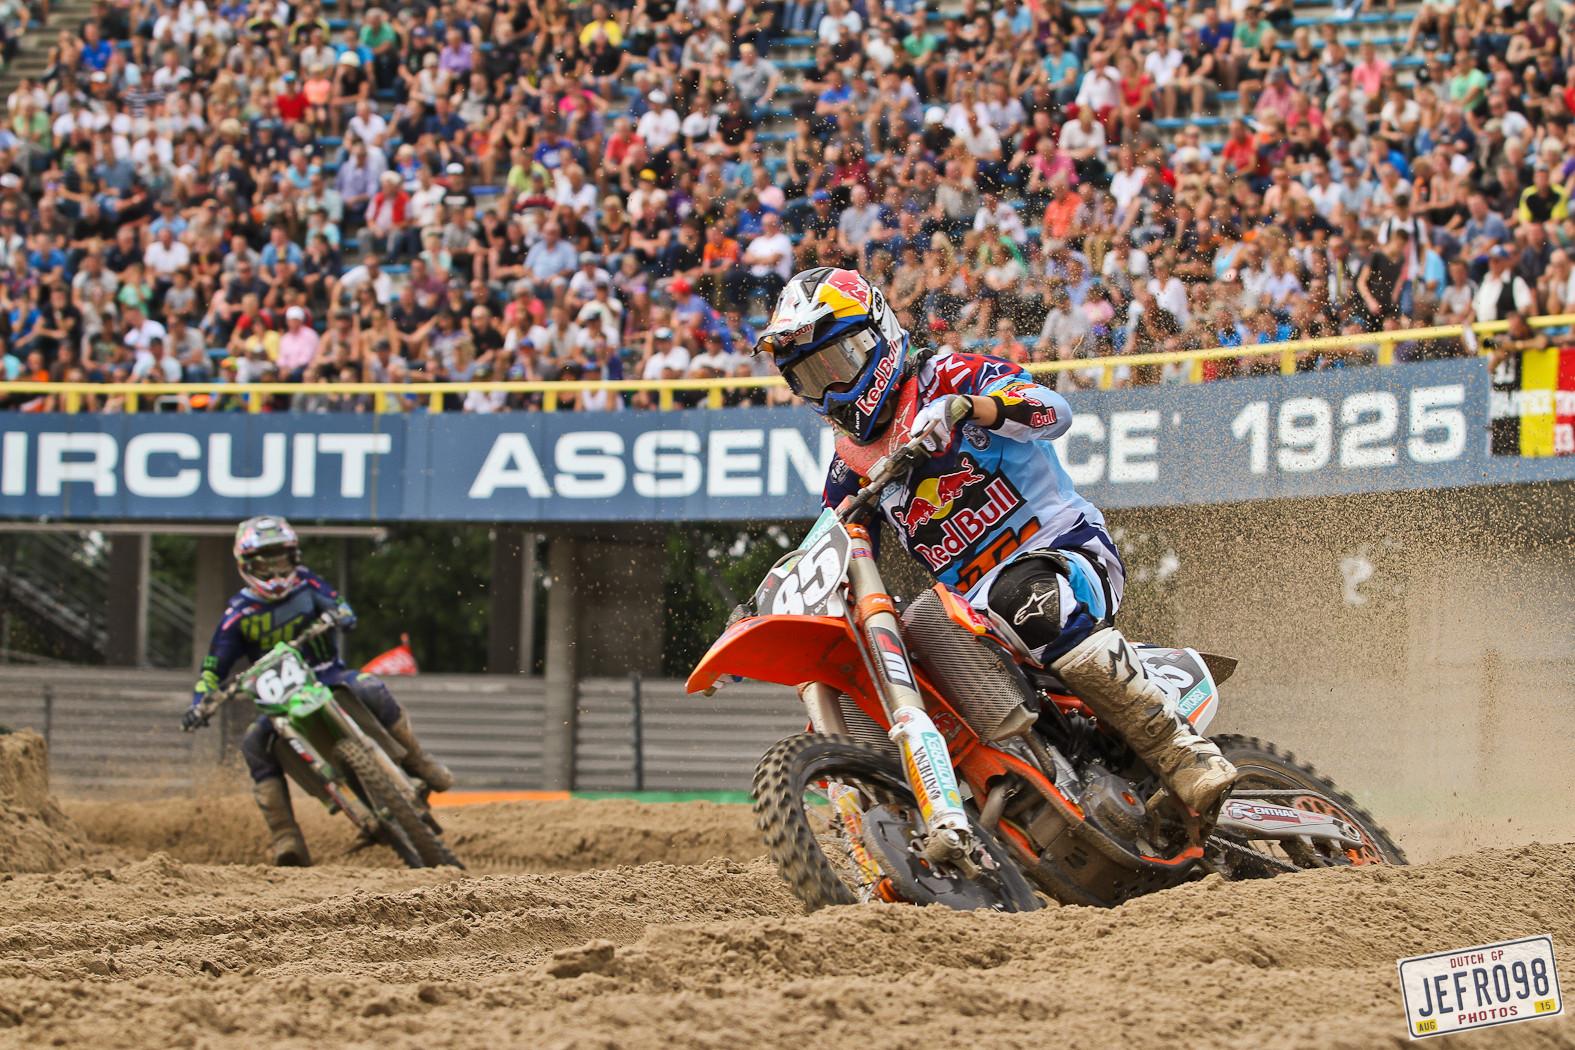 Davy Pootjes - Photo Blast: MXGP of the Netherlands - Motocross Pictures - Vital MX